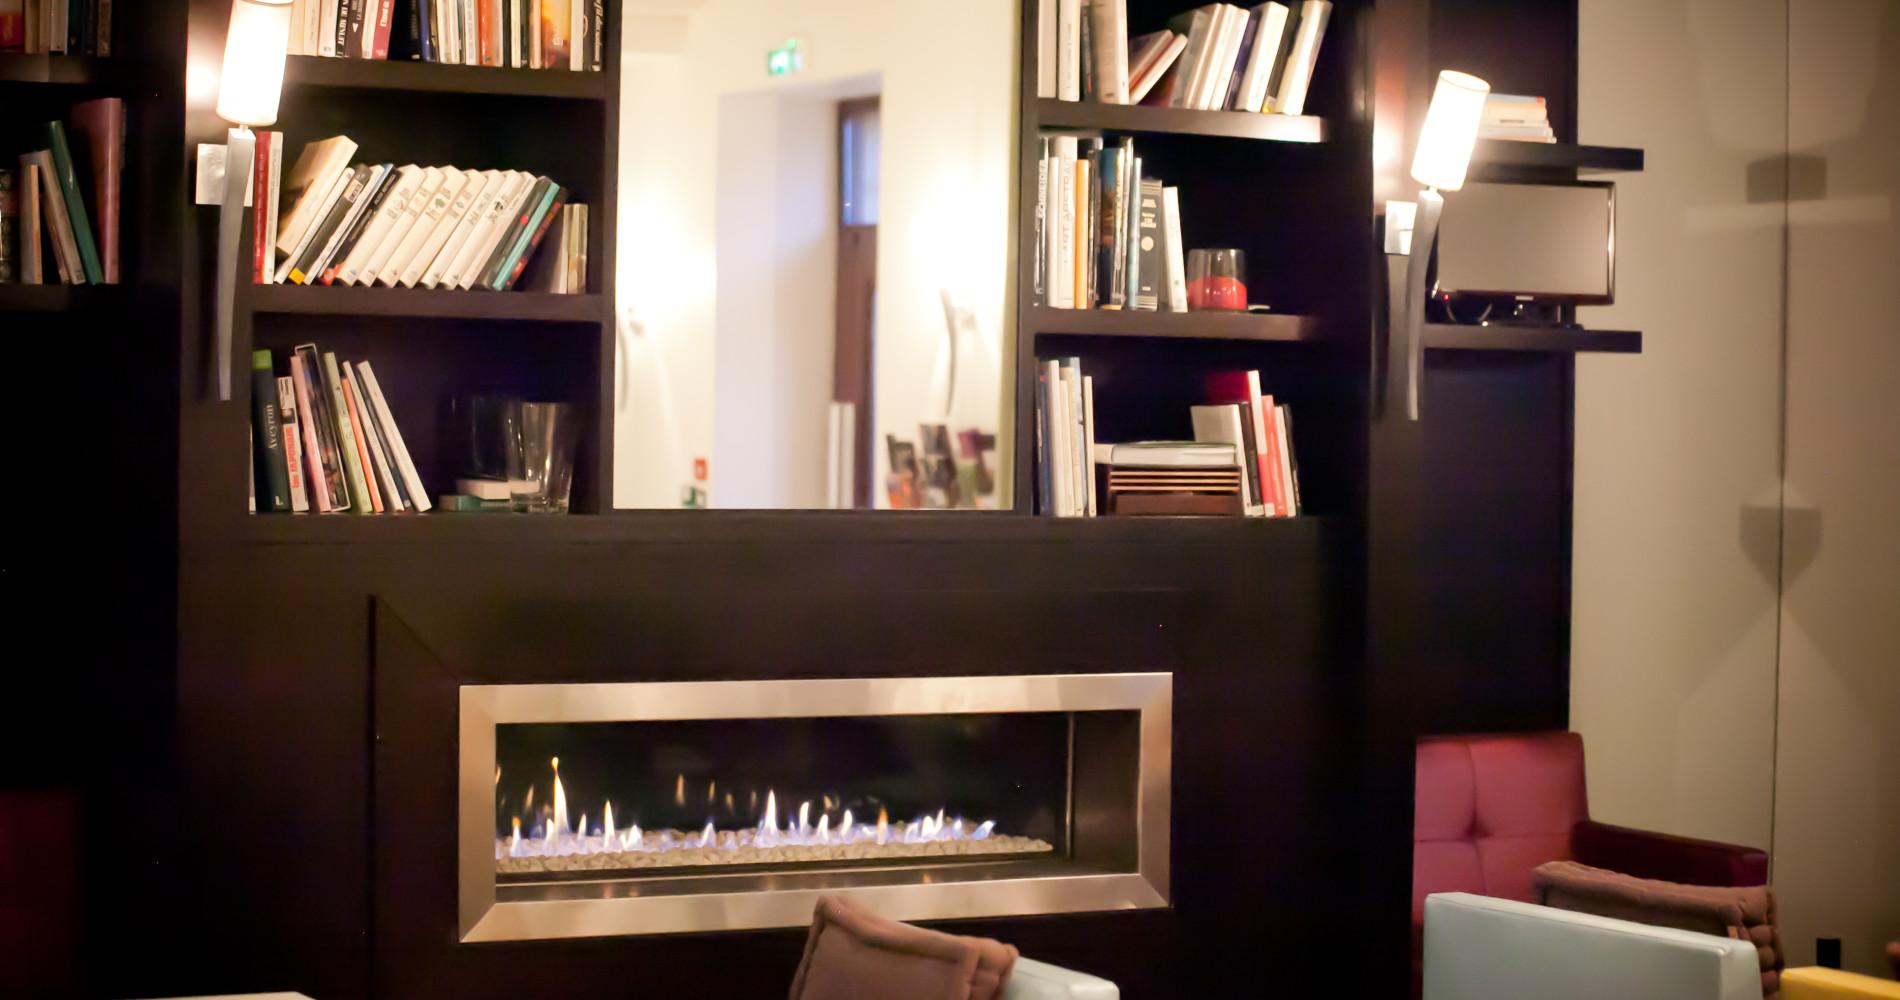 Hotel La ferme de Bourran 4 etoiles Rodez aveyron